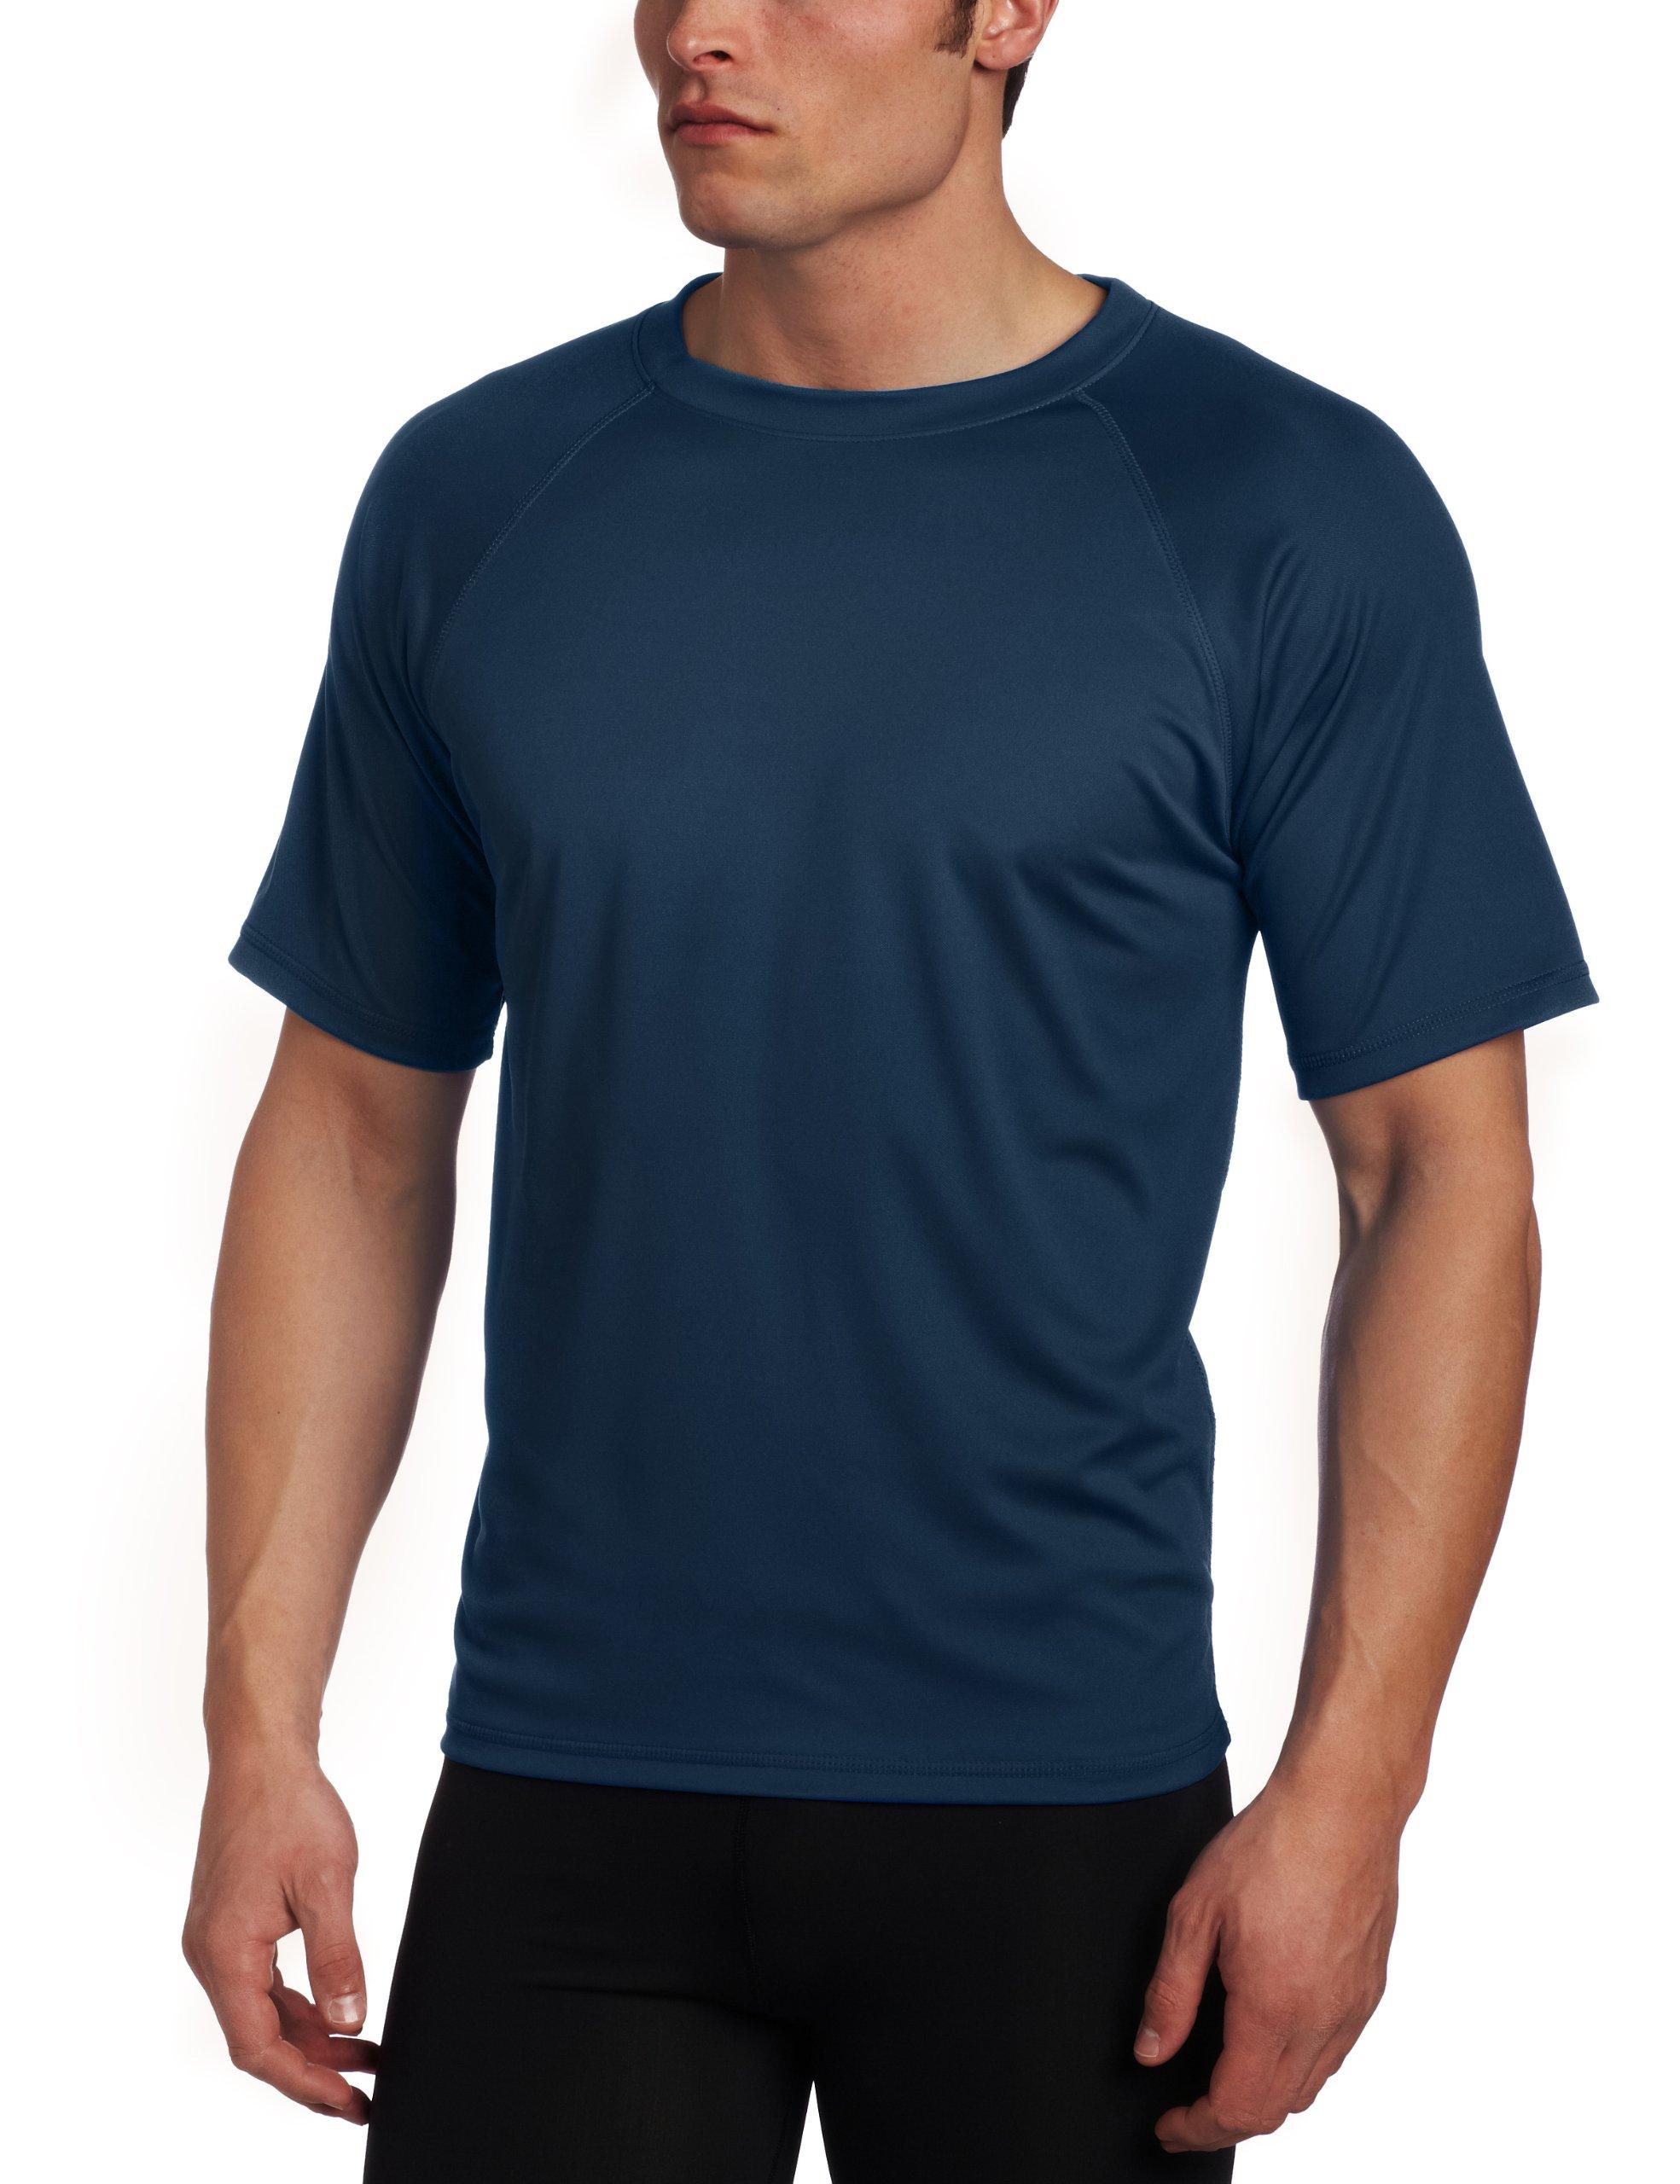 Kanu Surf Men's Solid Rashguard UPF 50+ Swim Shirt, Navy, XX-Large